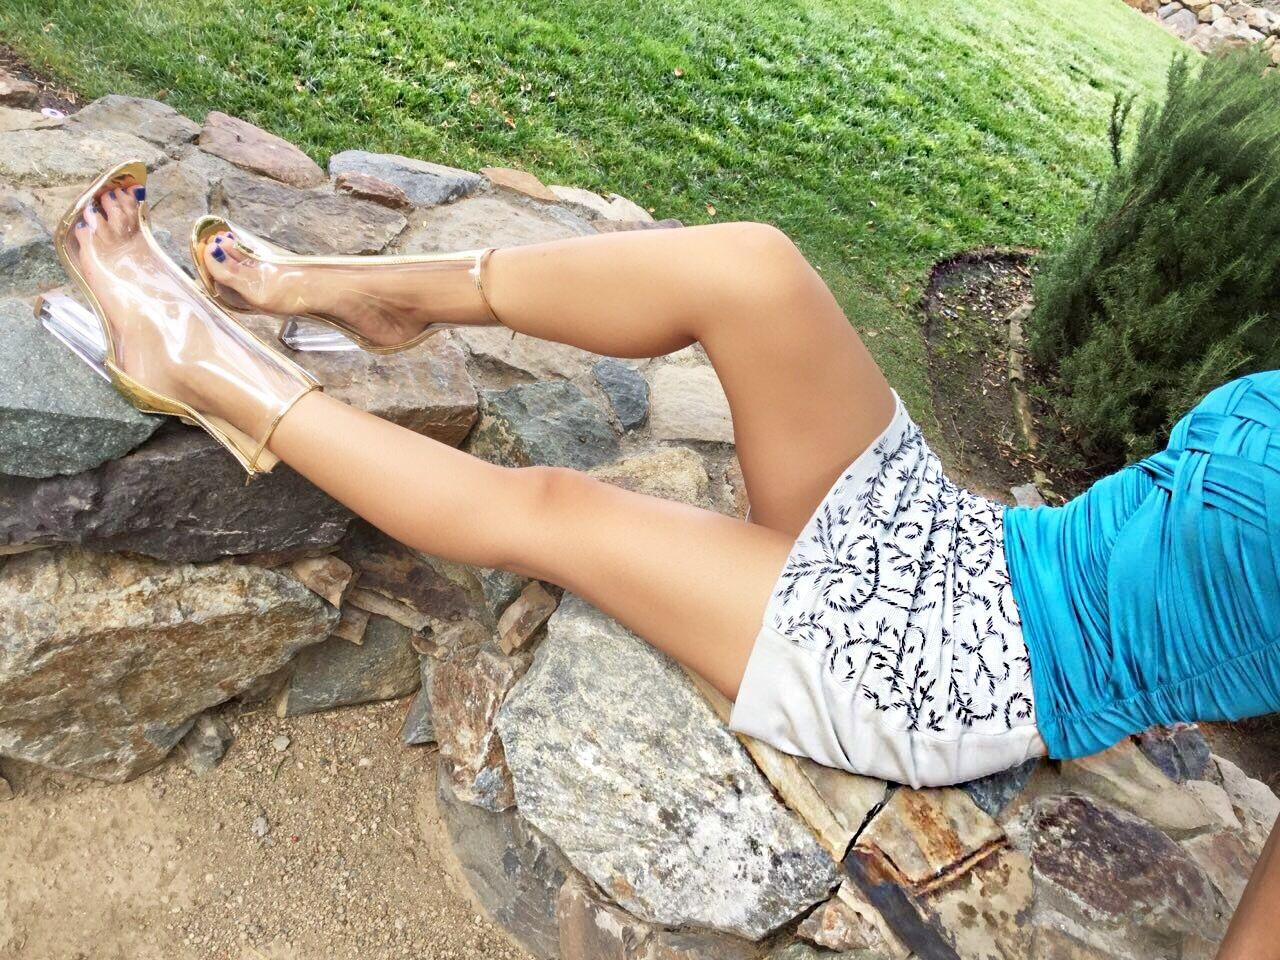 Shoe Republic Mitsie Open Toe Block Chunky Clear Perspex Lucite Heel Bootie